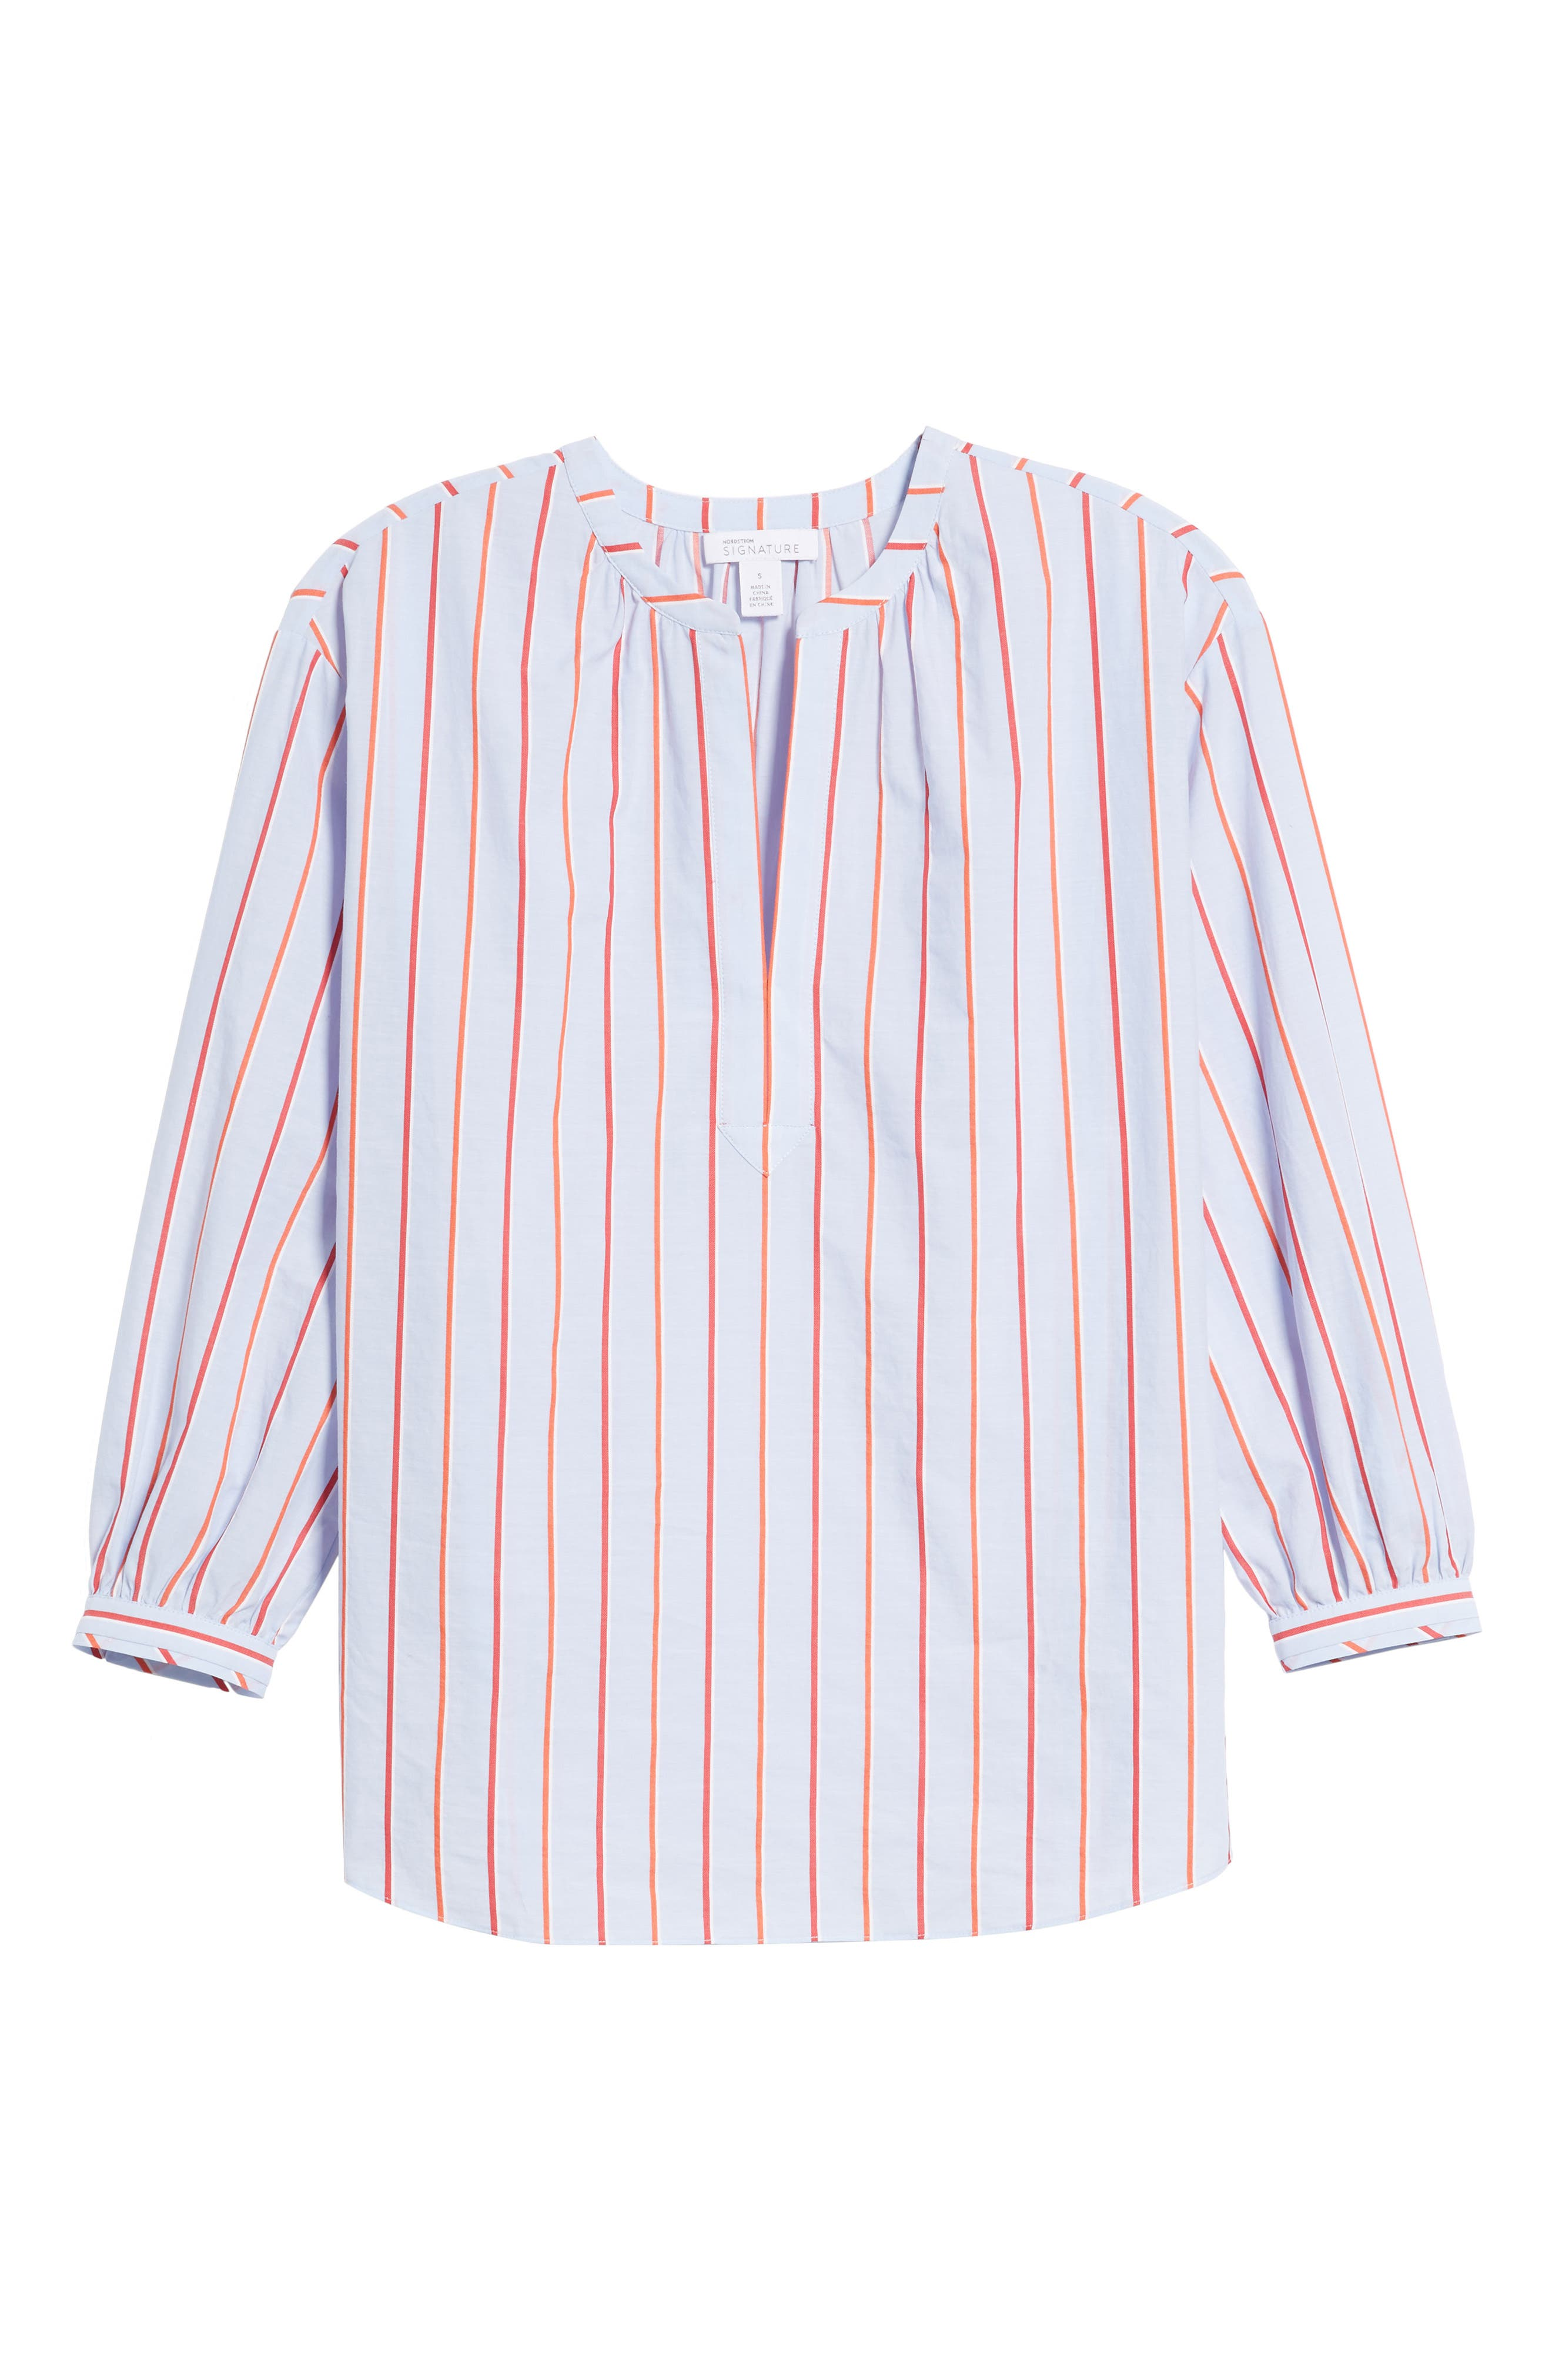 Balloon Sleeve Stripe Shirt,                             Alternate thumbnail 6, color,                             Orange- Blue Stripe